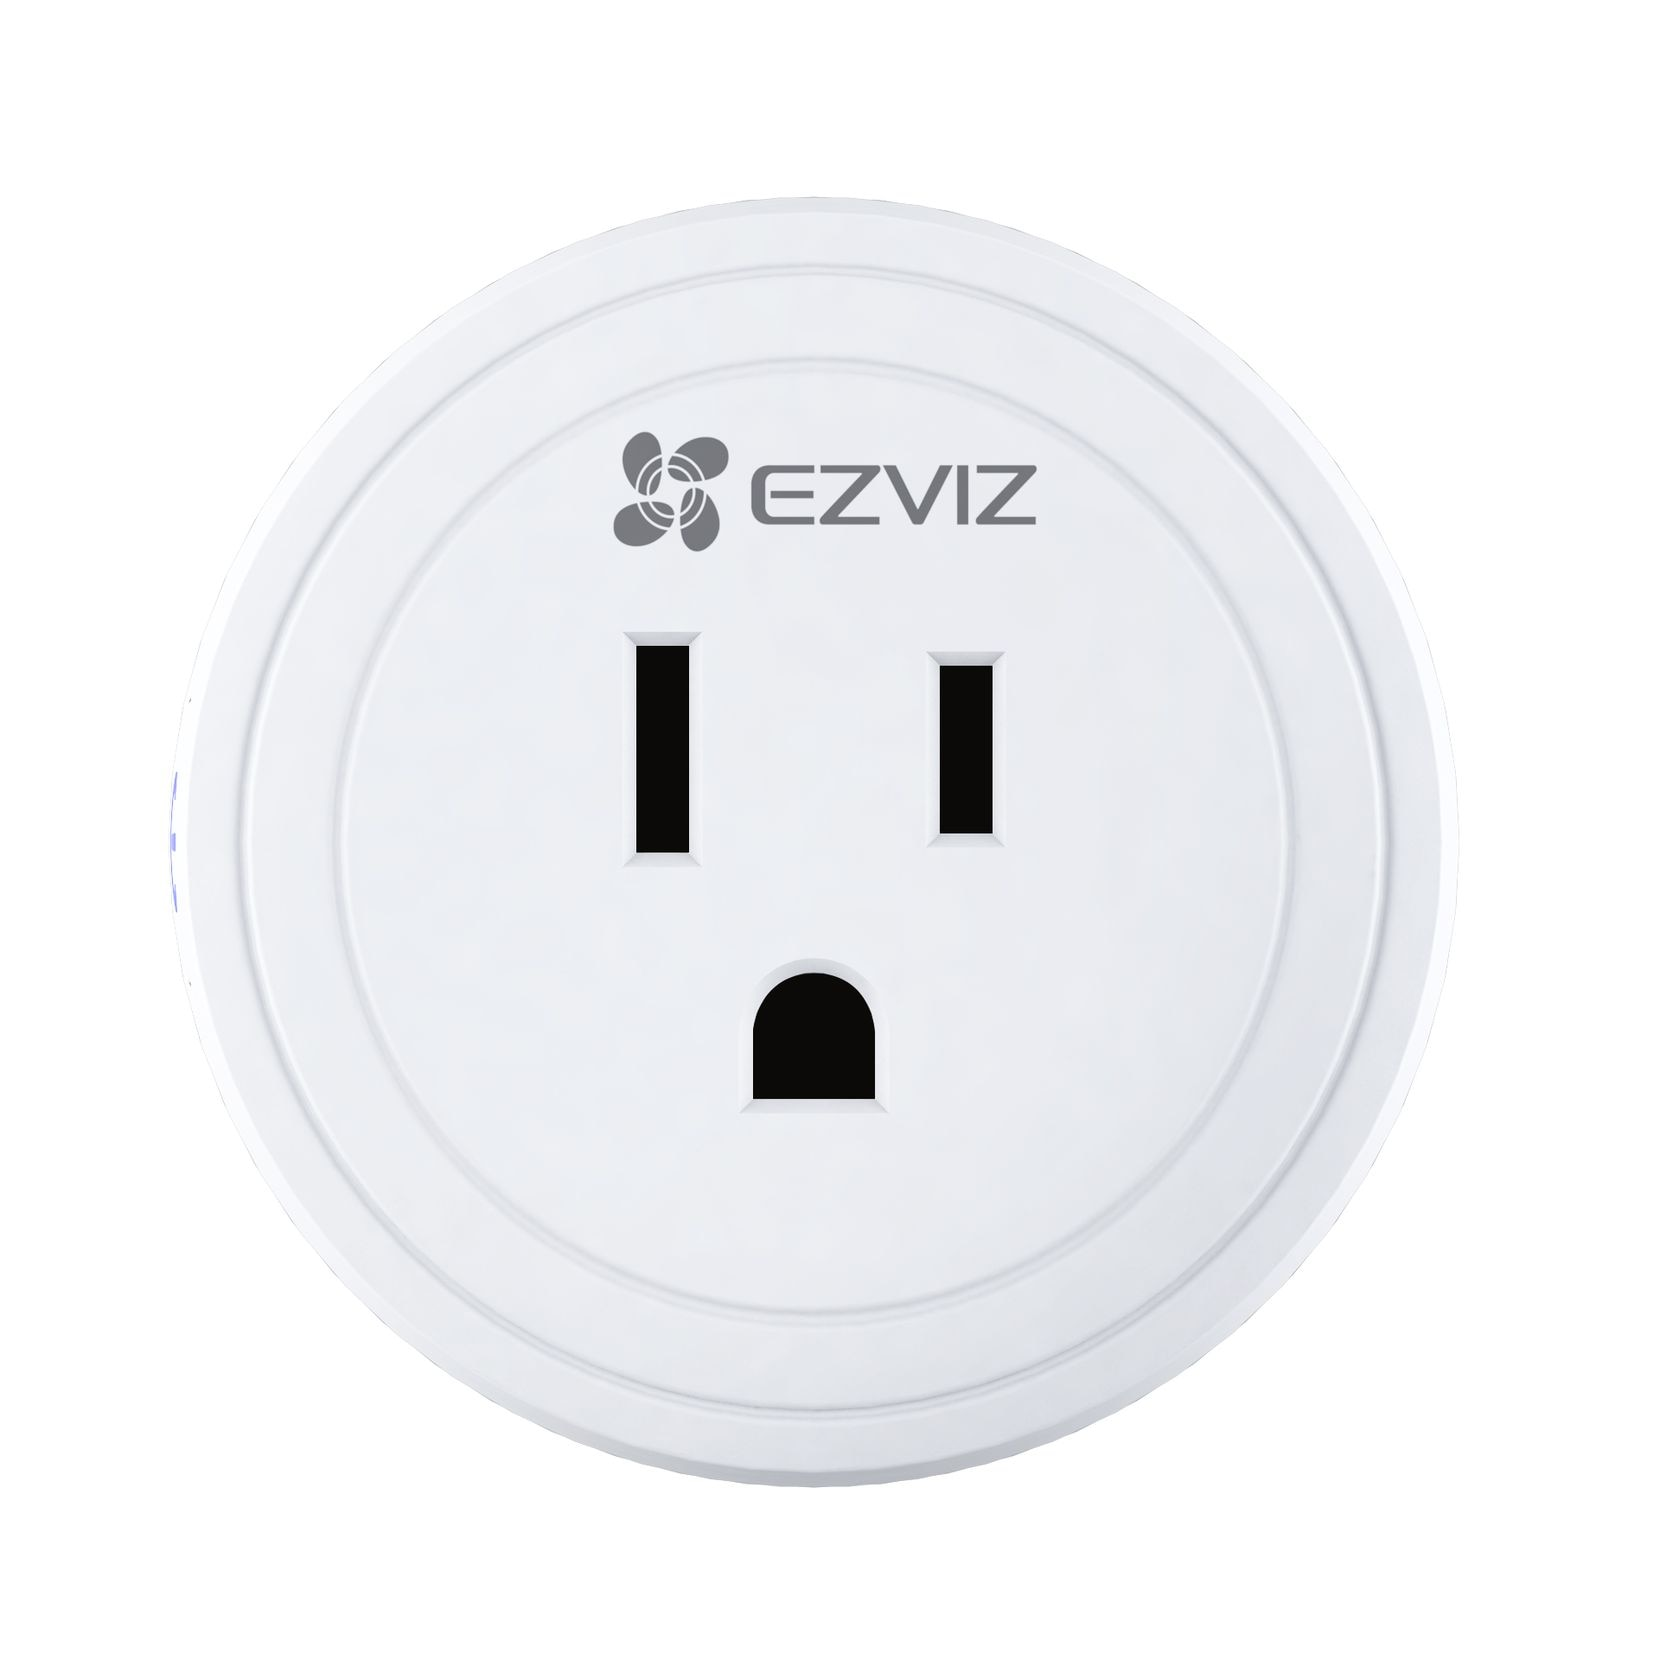 The EZVIZ T30-110A smart plug